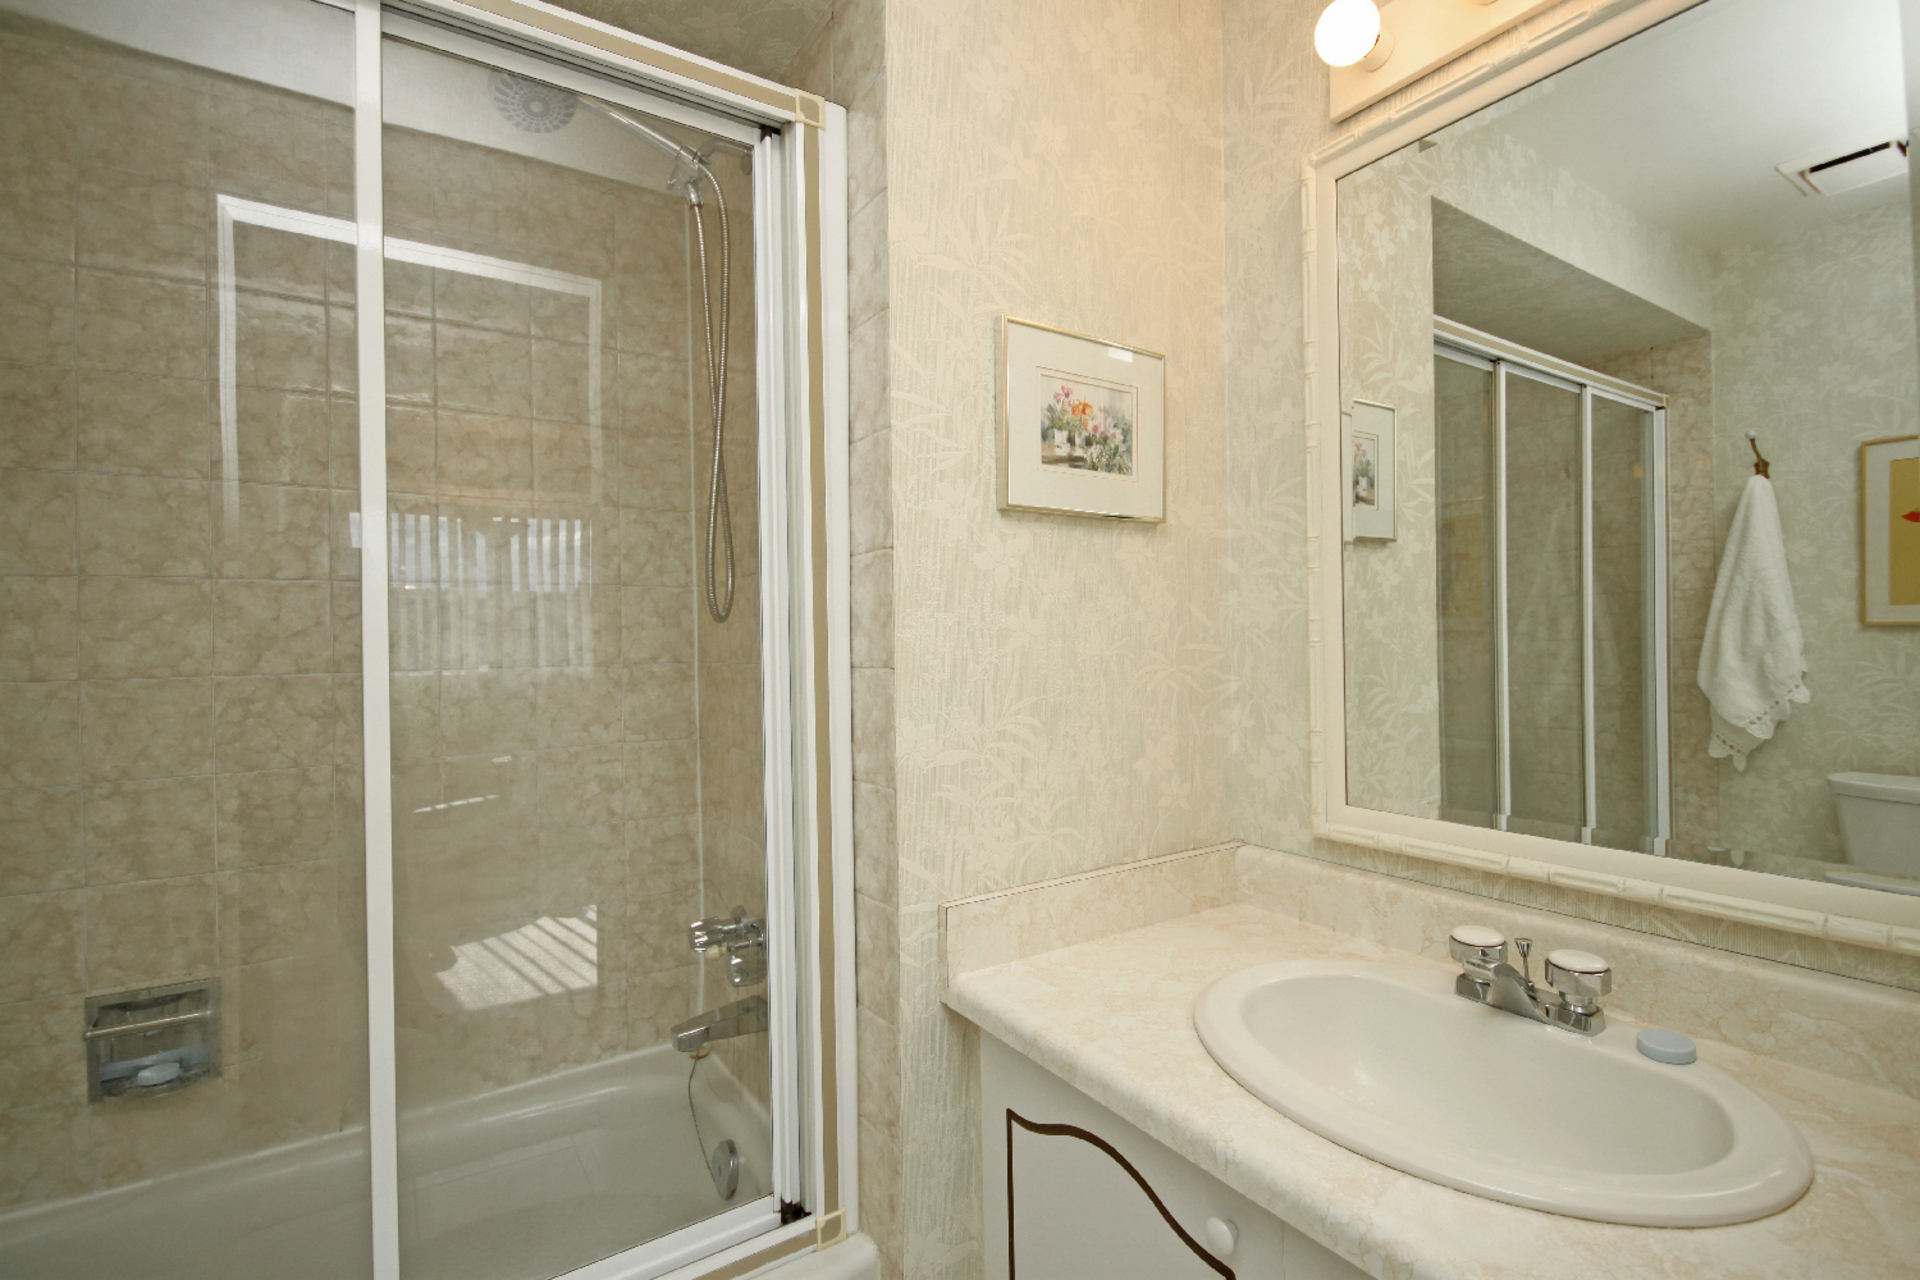 4 Piece Ensuite Bathroom at 93 Dutch Myrtle Way, Banbury-Don Mills, Toronto